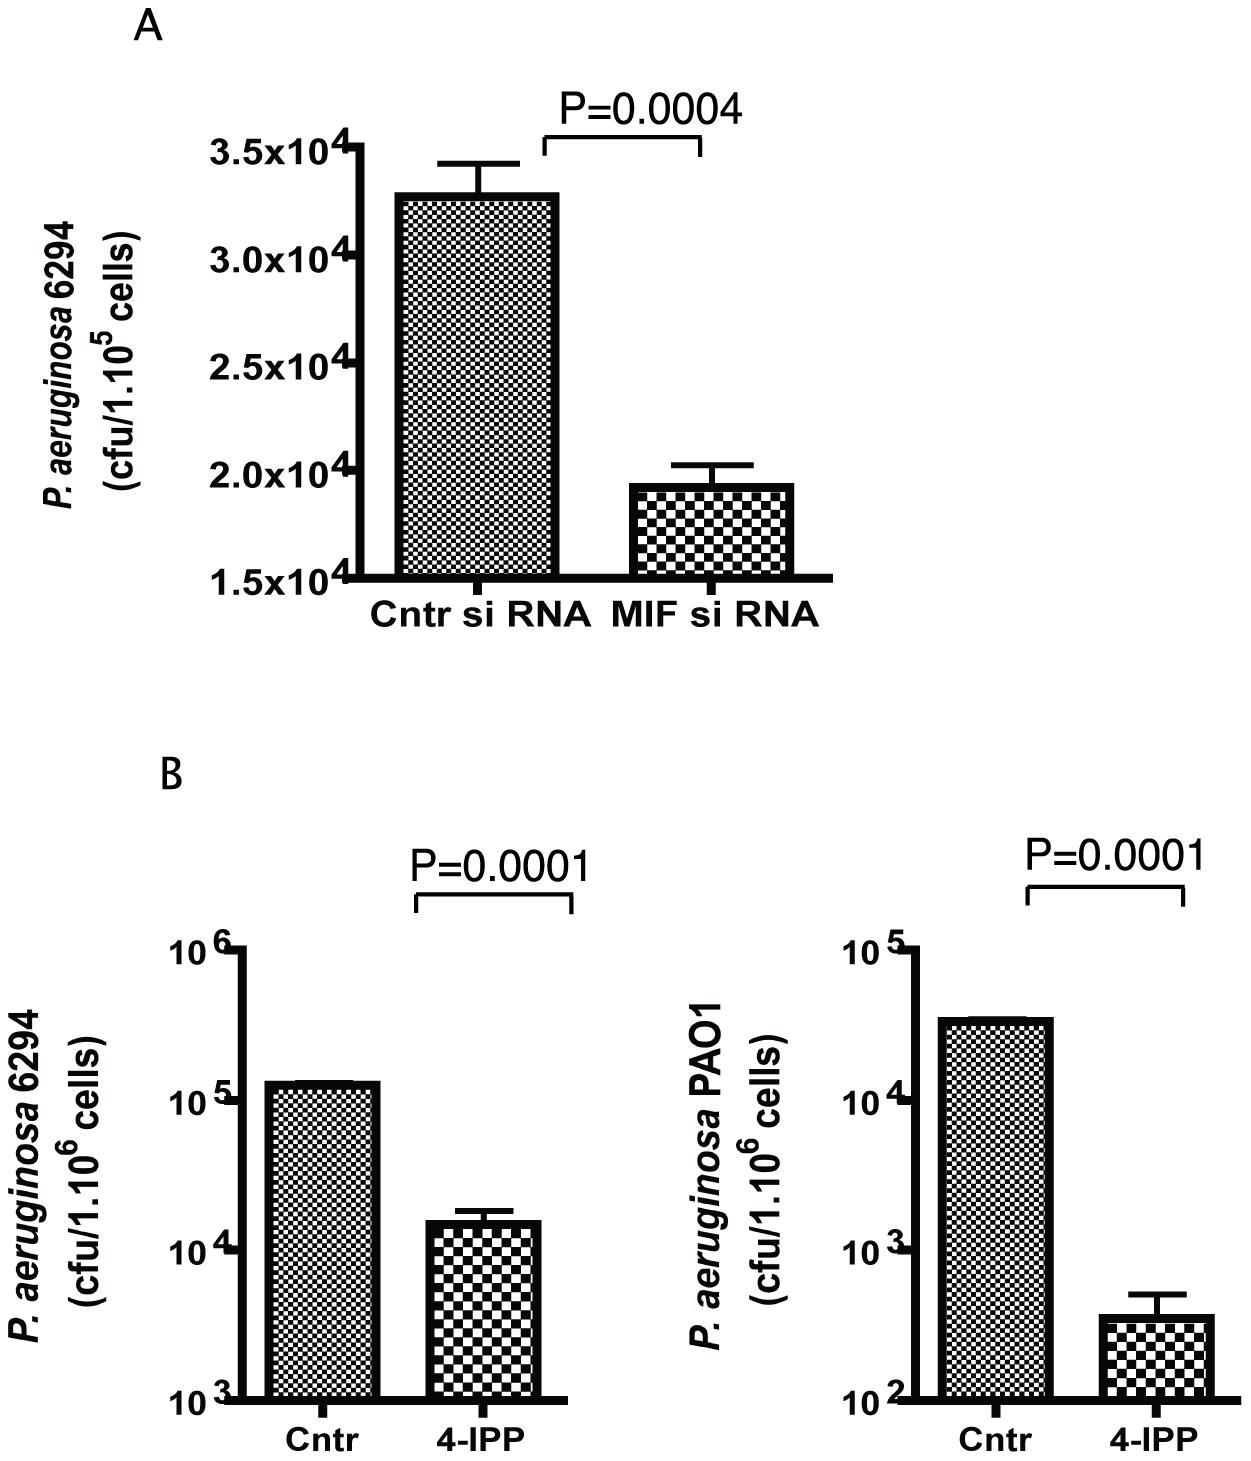 4-IPP inhibits <i>P. aeruginosa</i> invasion of corneal epithelial cells.